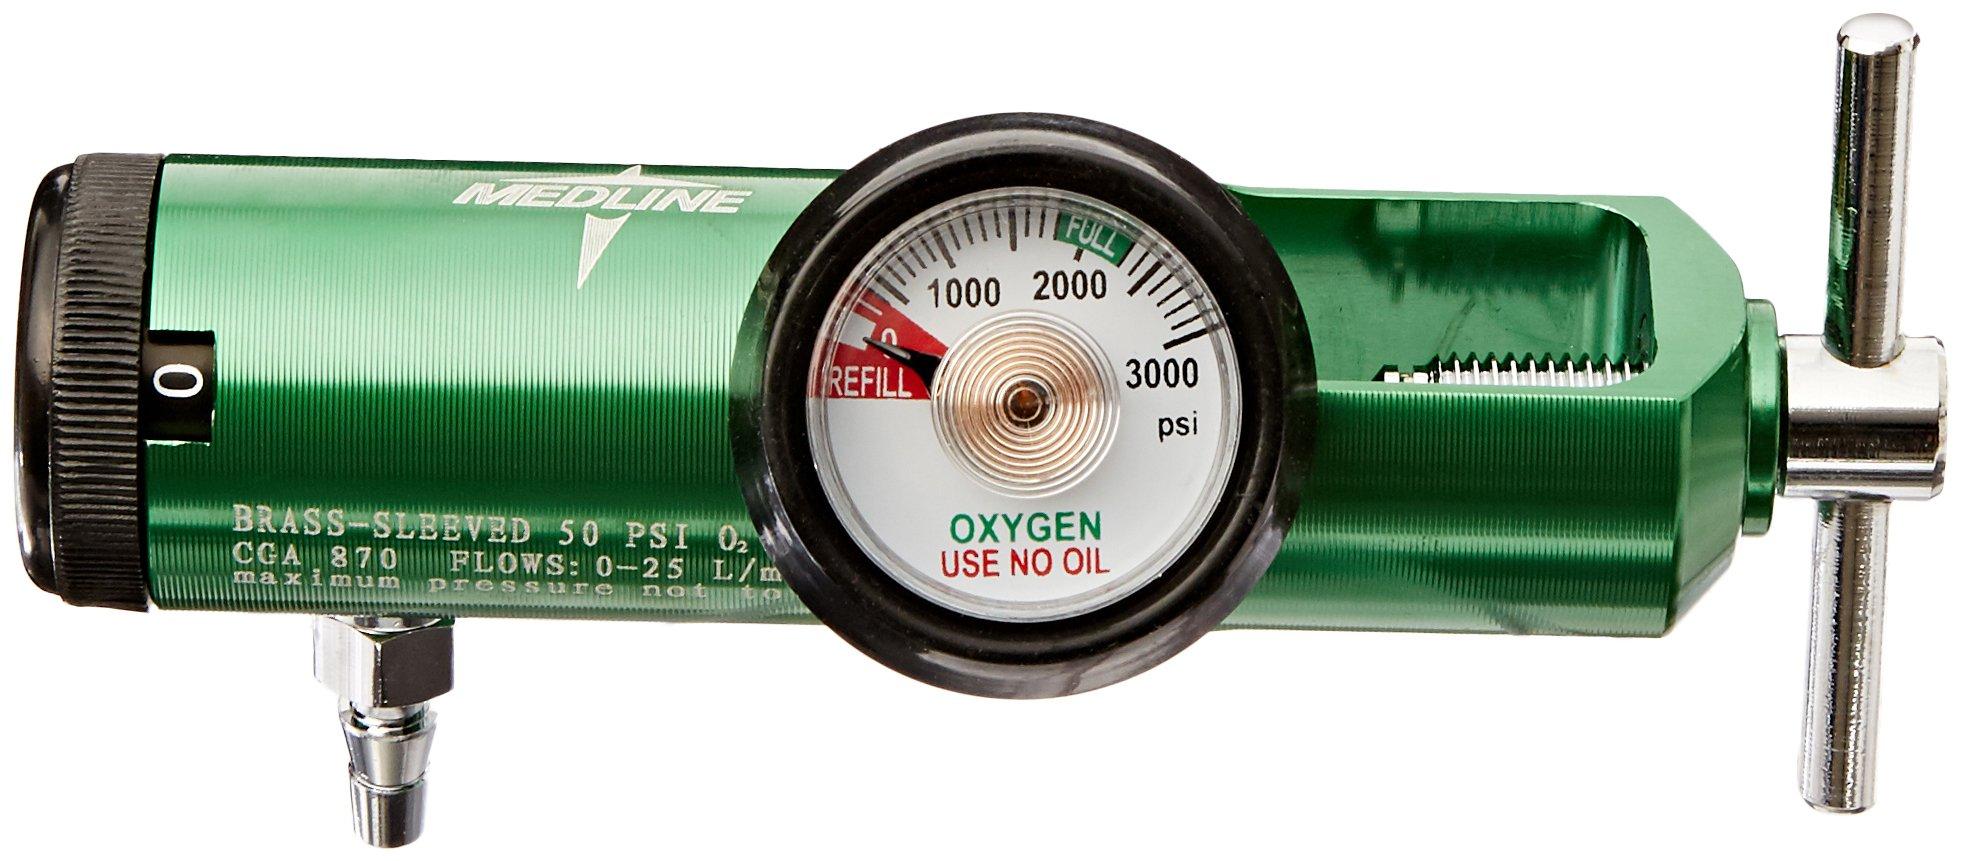 Medline HCS8725M Mini Oxygen Regulator, Latex Free, 0 - 25 Liters per Minute, 870 CGA Connection, Brass Sleeve by Medline